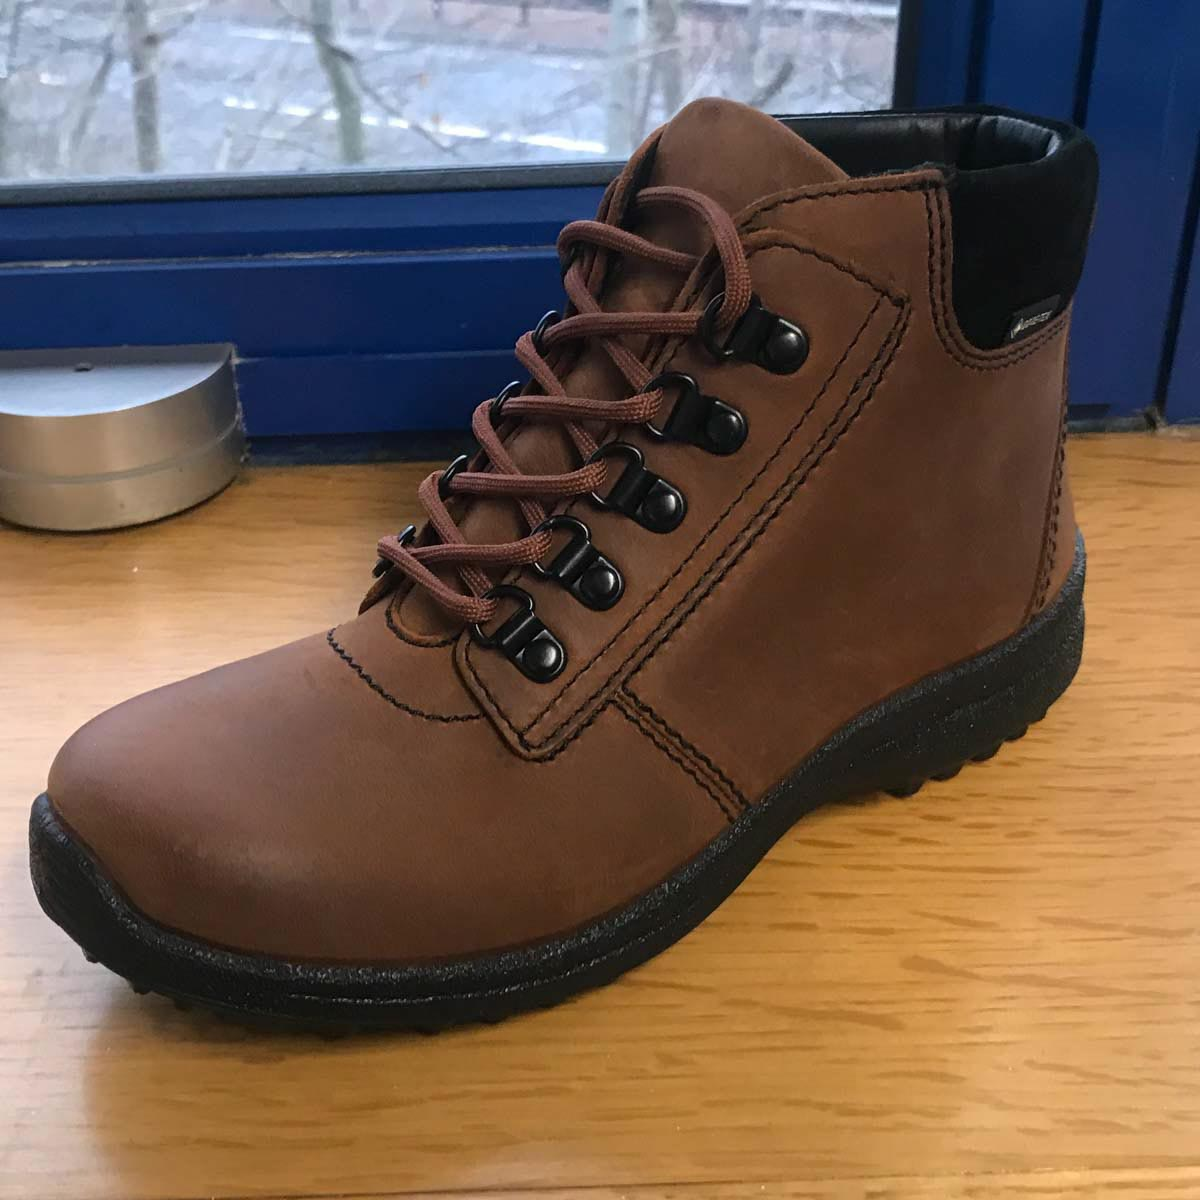 65c835c78f4 9508/11 Rutland Gtx E at Begg Shoes & Bags